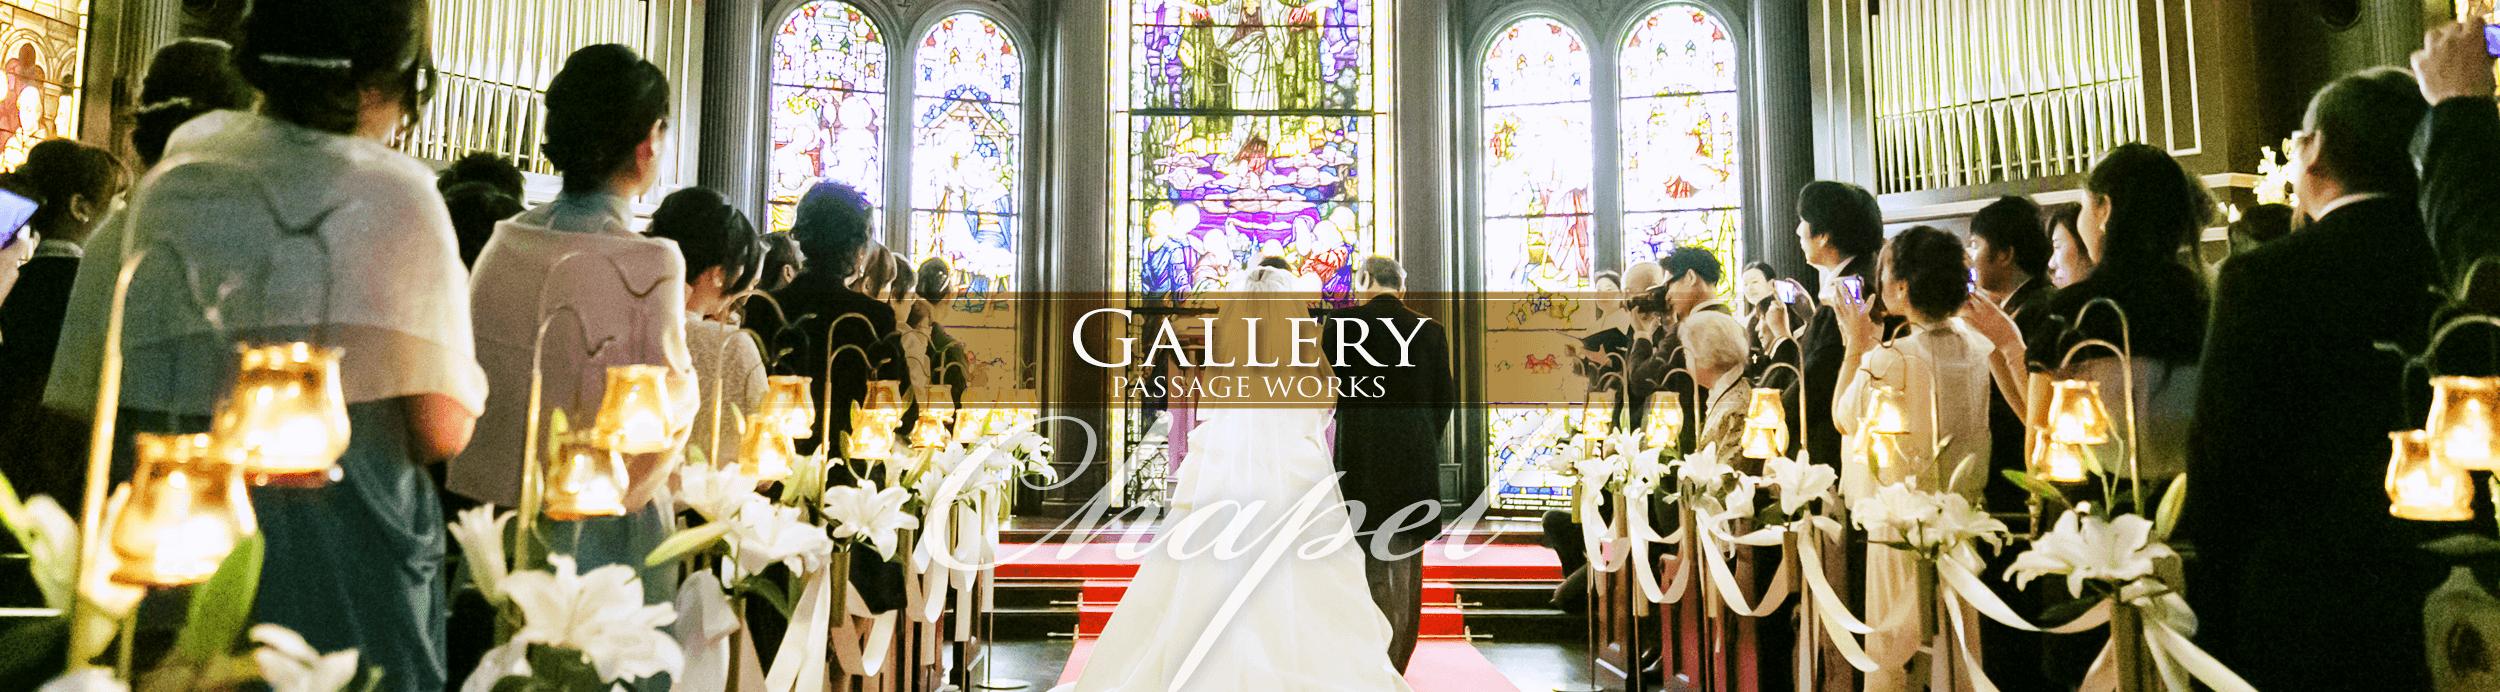 GALLERY-chapel|洋装ー教会撮影